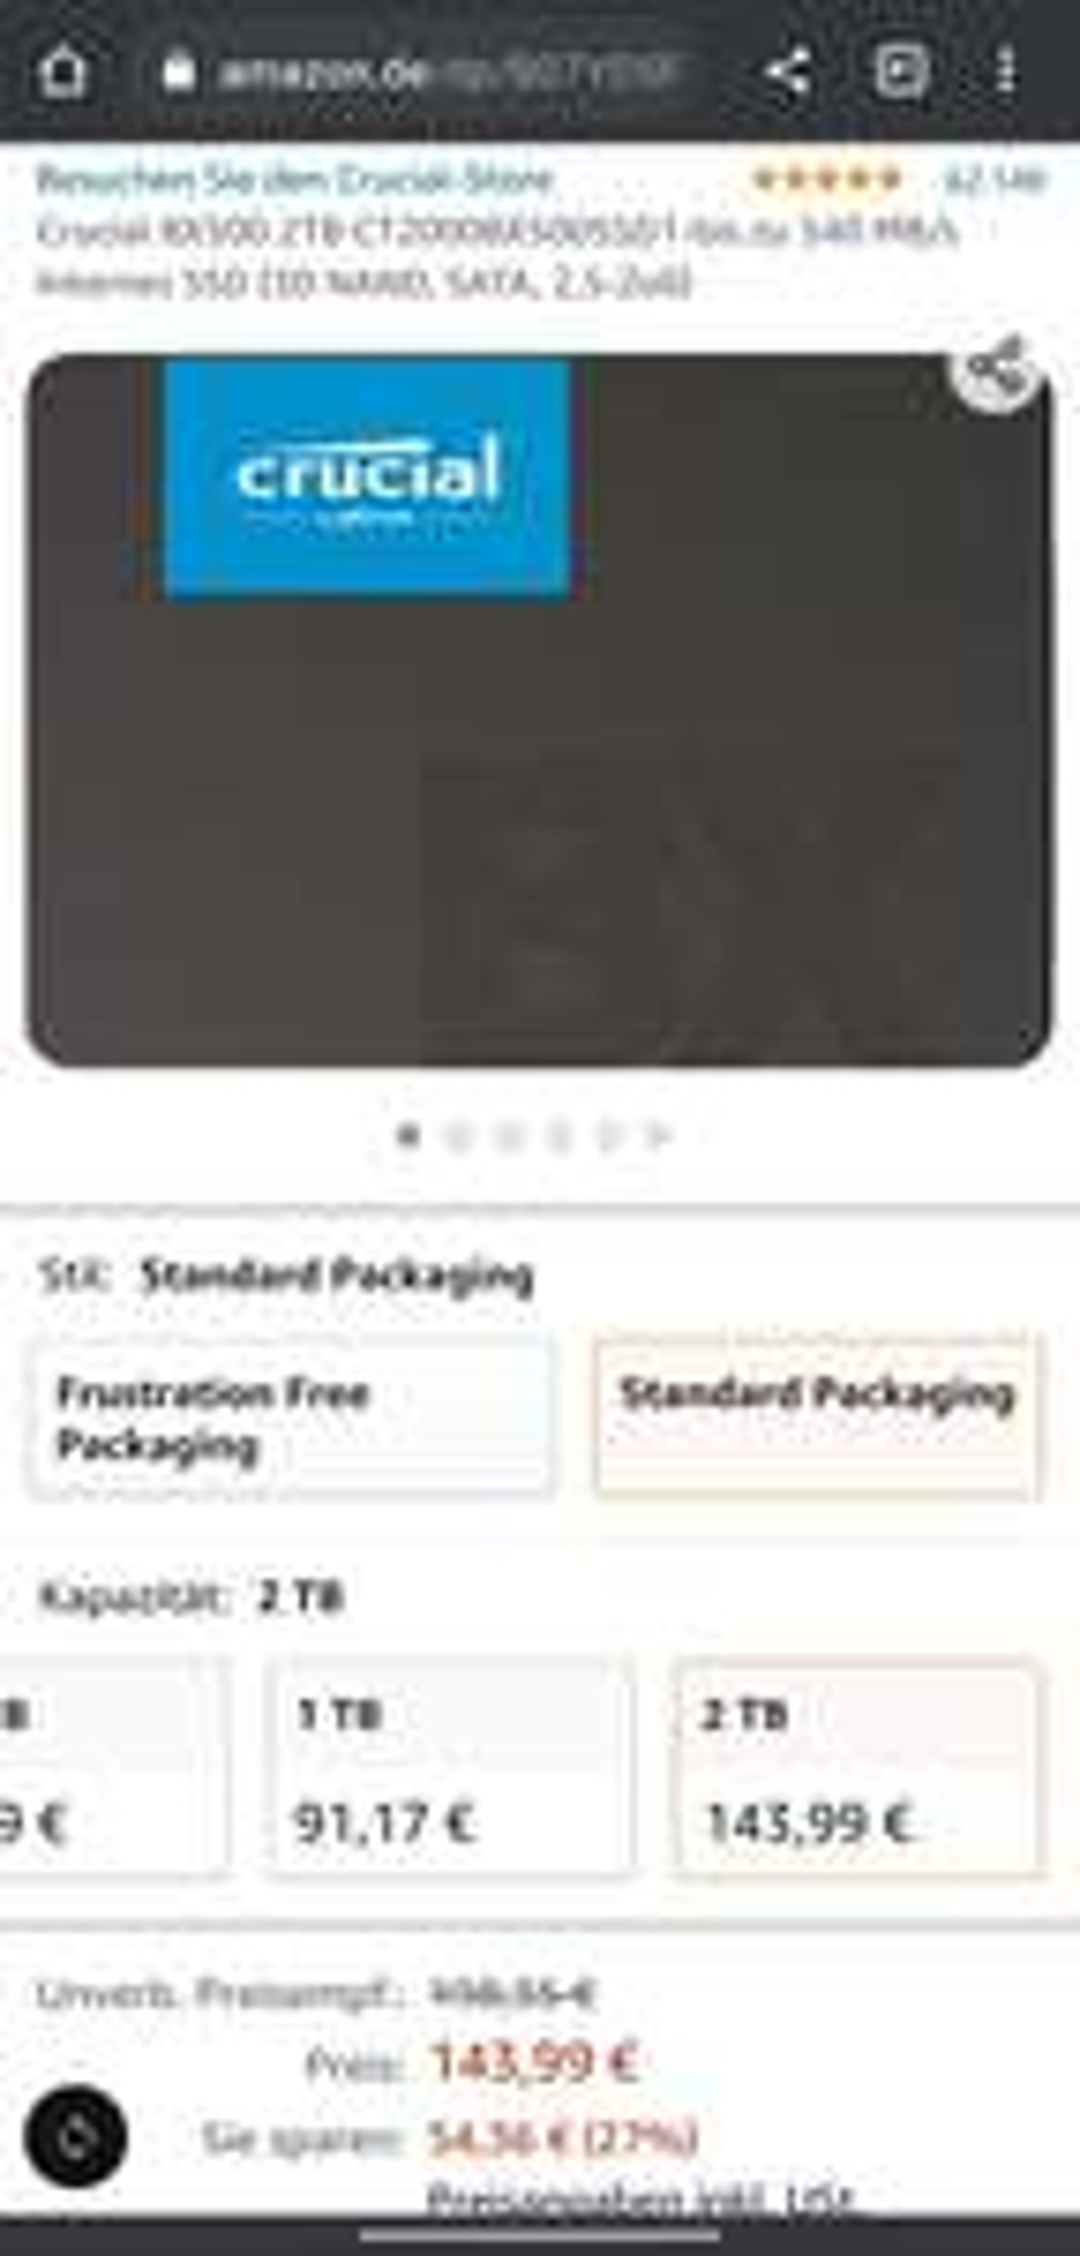 Crucial BX500 2TB CT2000BX500SSD1-bis zu 540 MB/s Internes SSD (3D NAND, SATA, 2,5-Zoll)